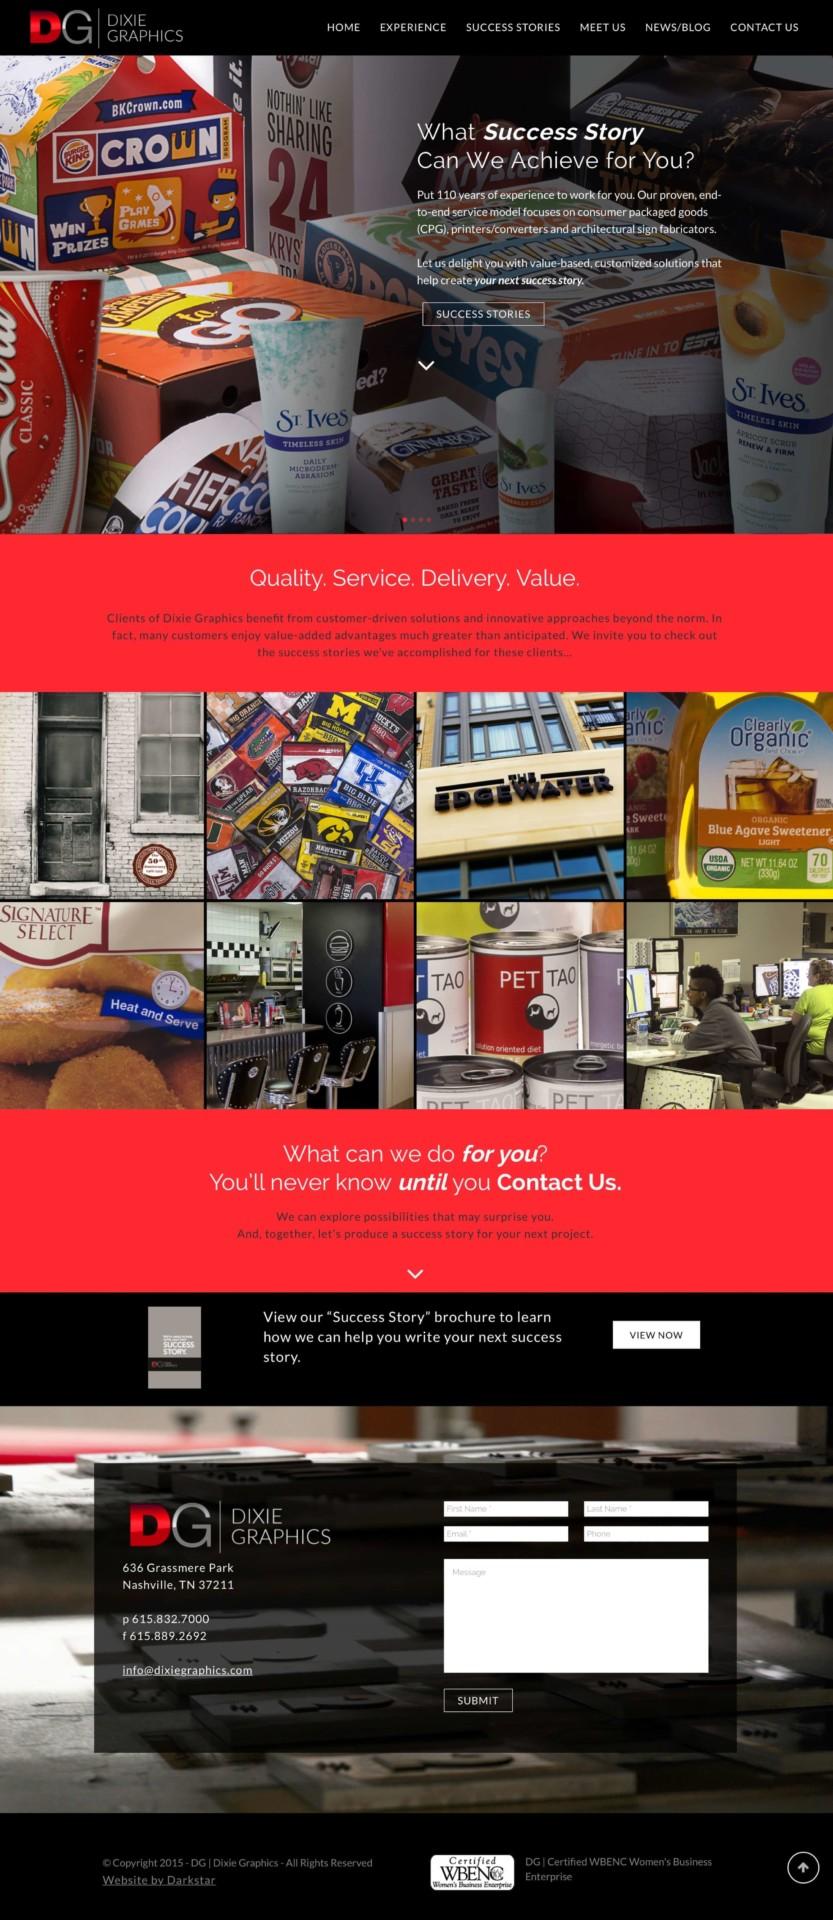 Dixie Graphics - Website Design